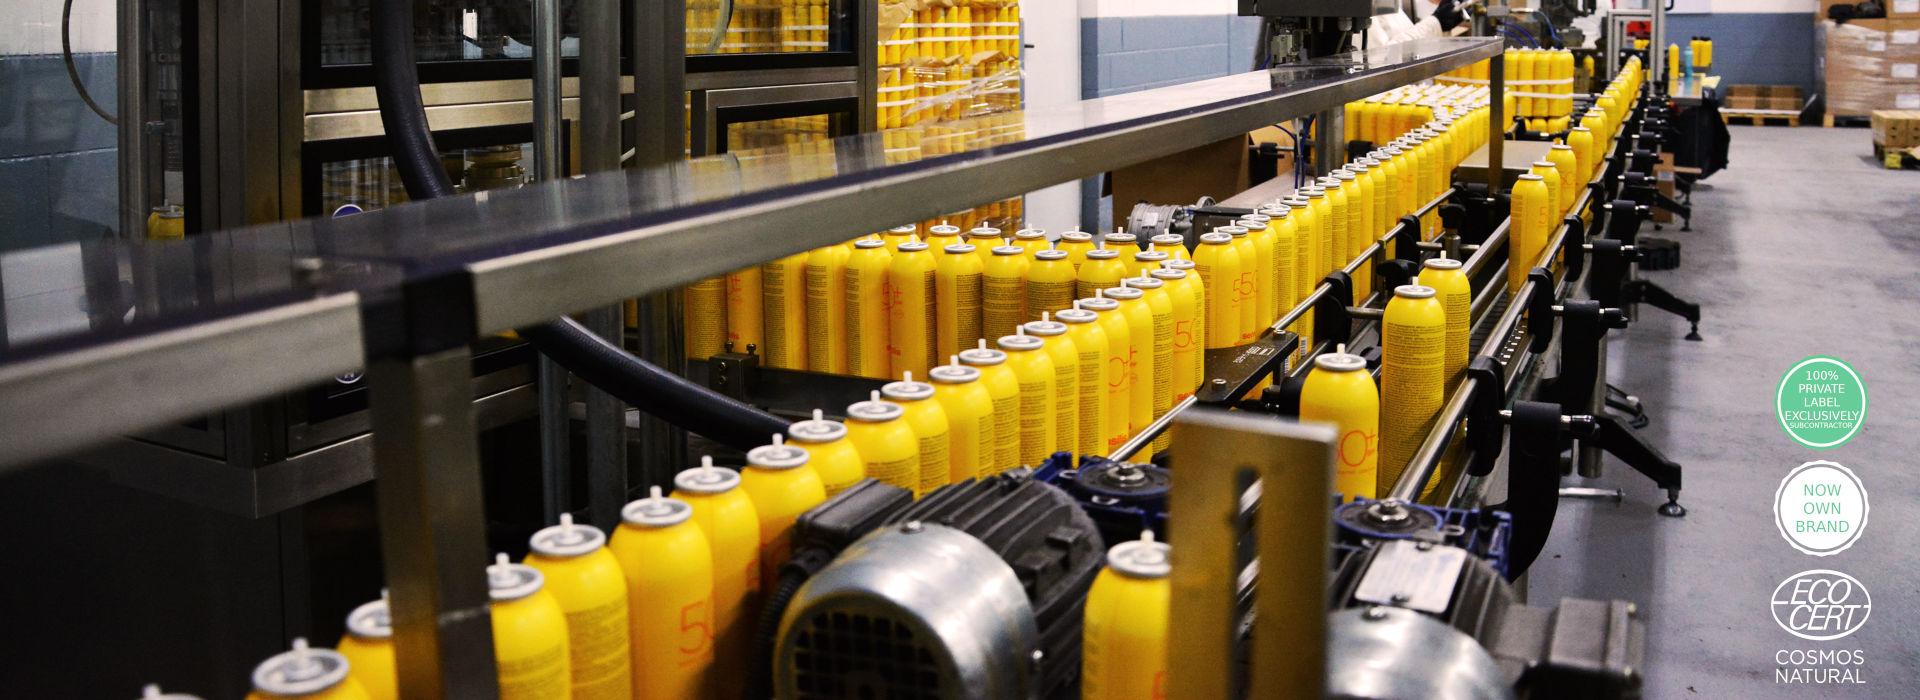 Proersa factory production line